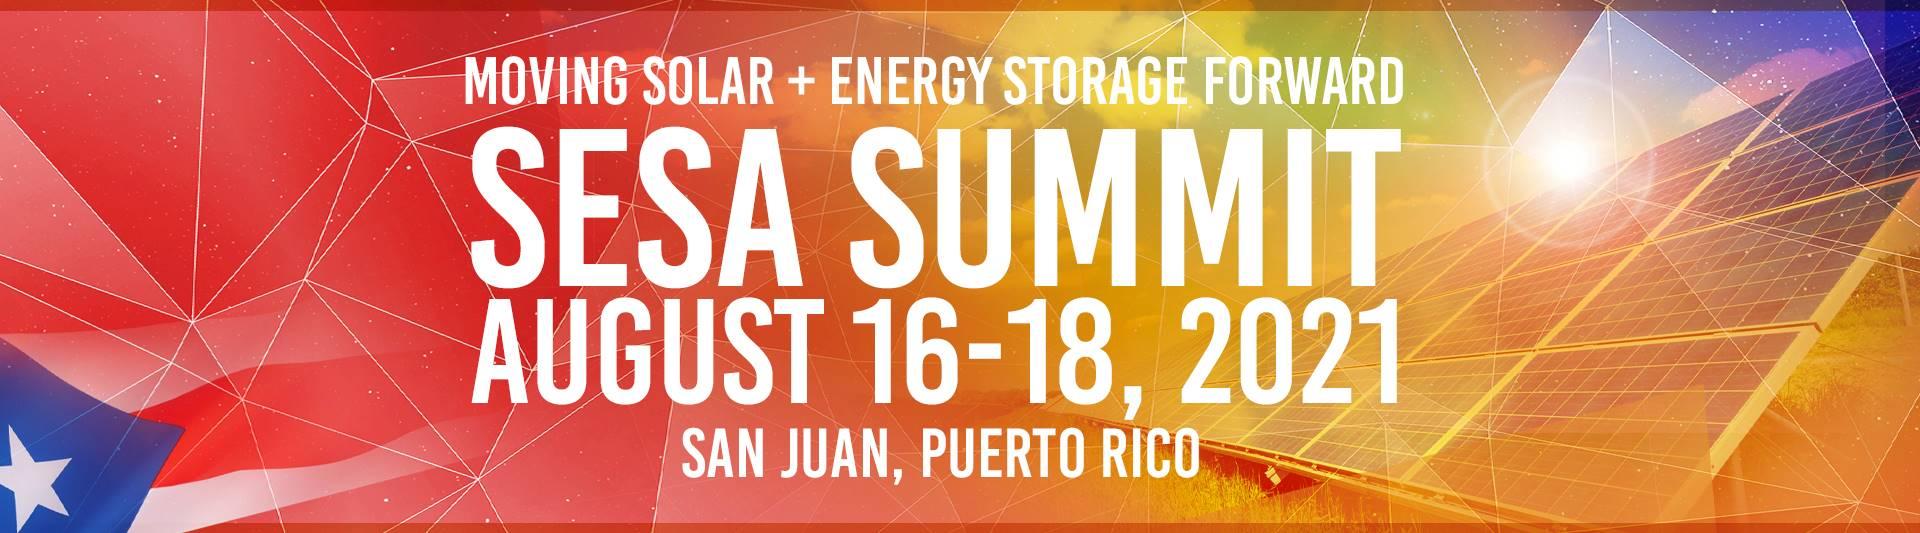 SESA Summit 2021